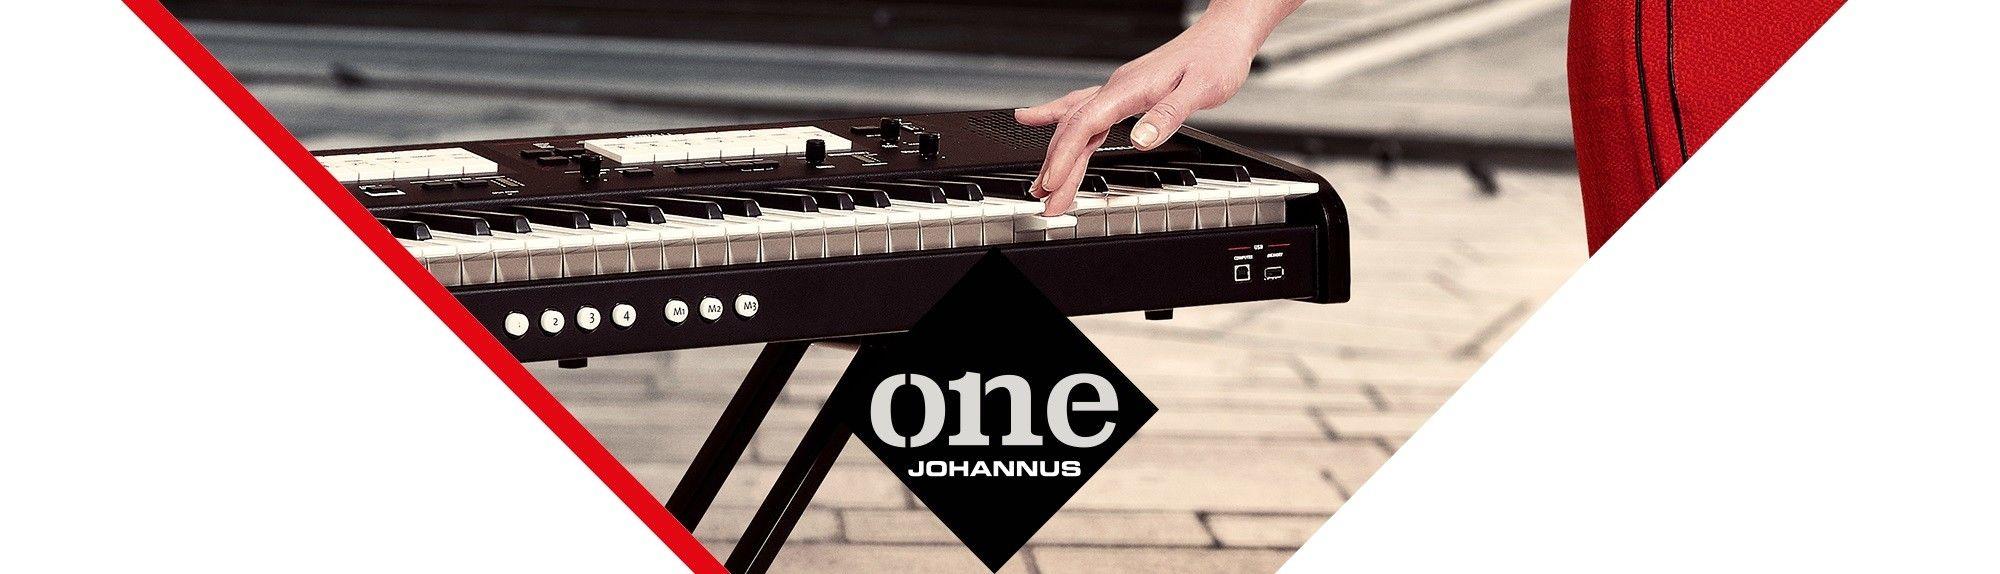 Het nieuwste Johannus orgel: Johannus One!